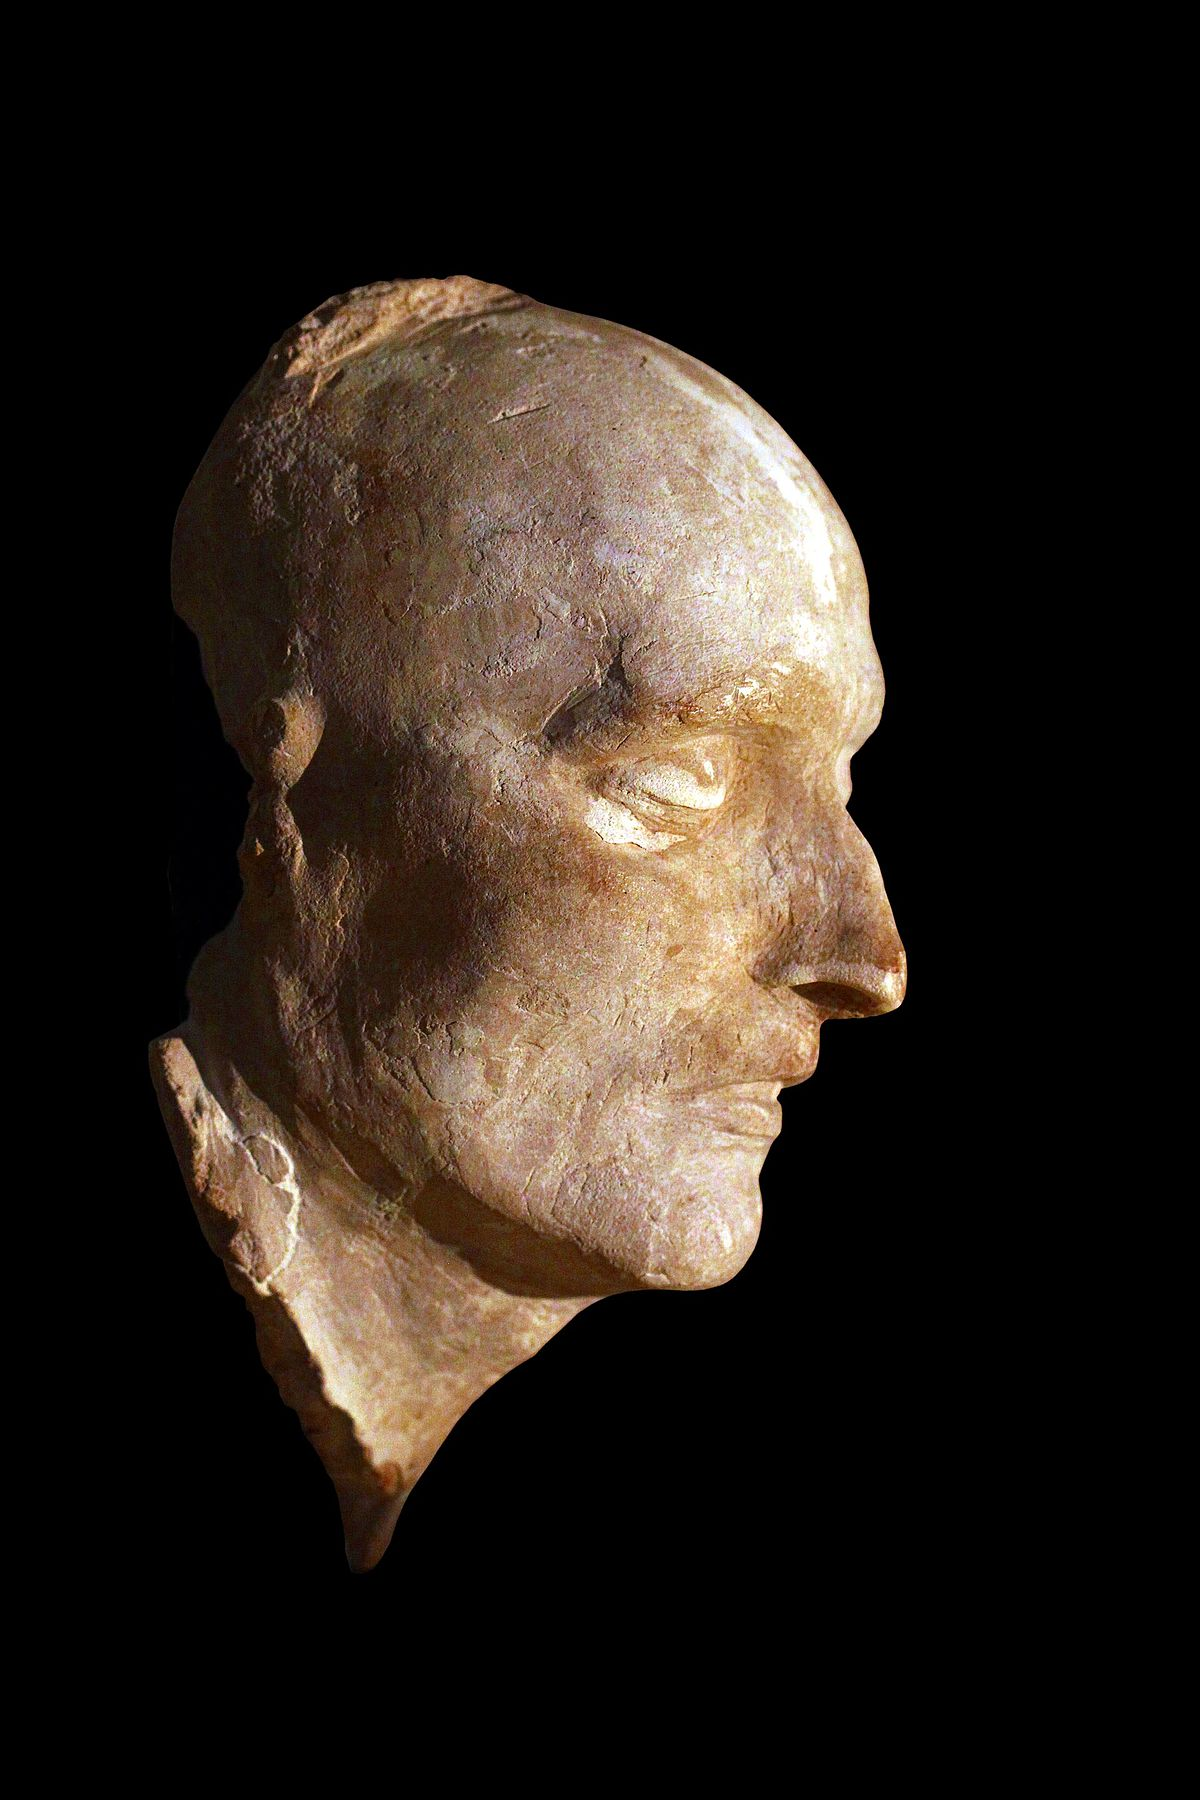 Favori Masque mortuaire de Napoléon Ier — Wikipédia ZE89